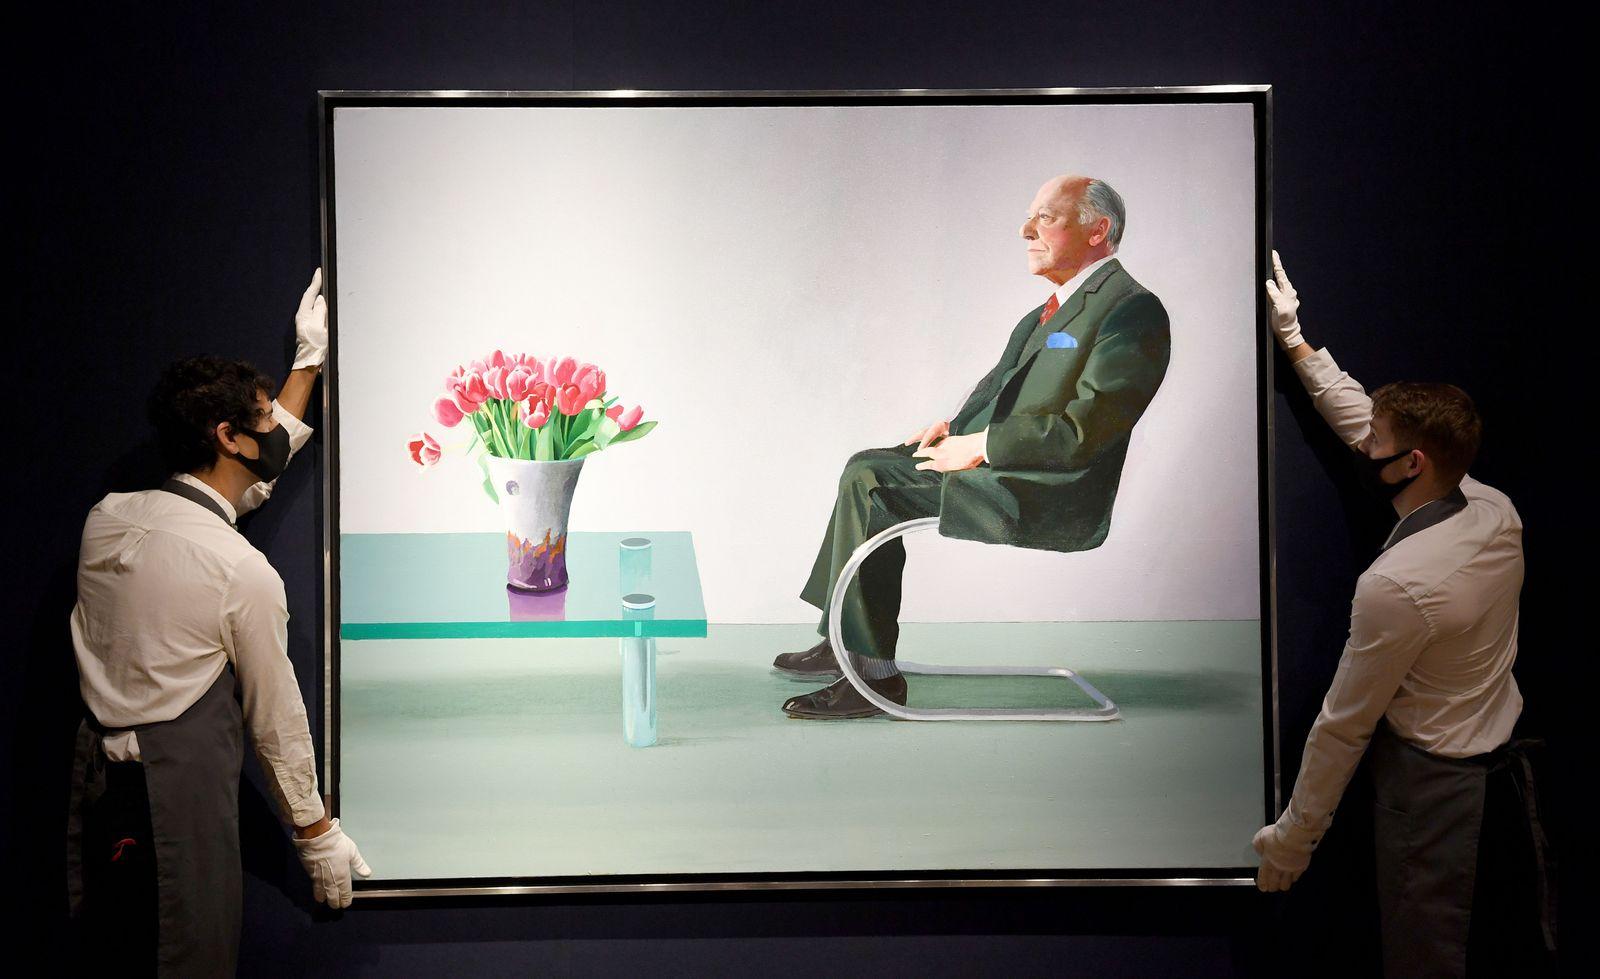 London's Royal Opera House sells David Hockney portrait to raise funds, United Kingdom - 09 Oct 2020